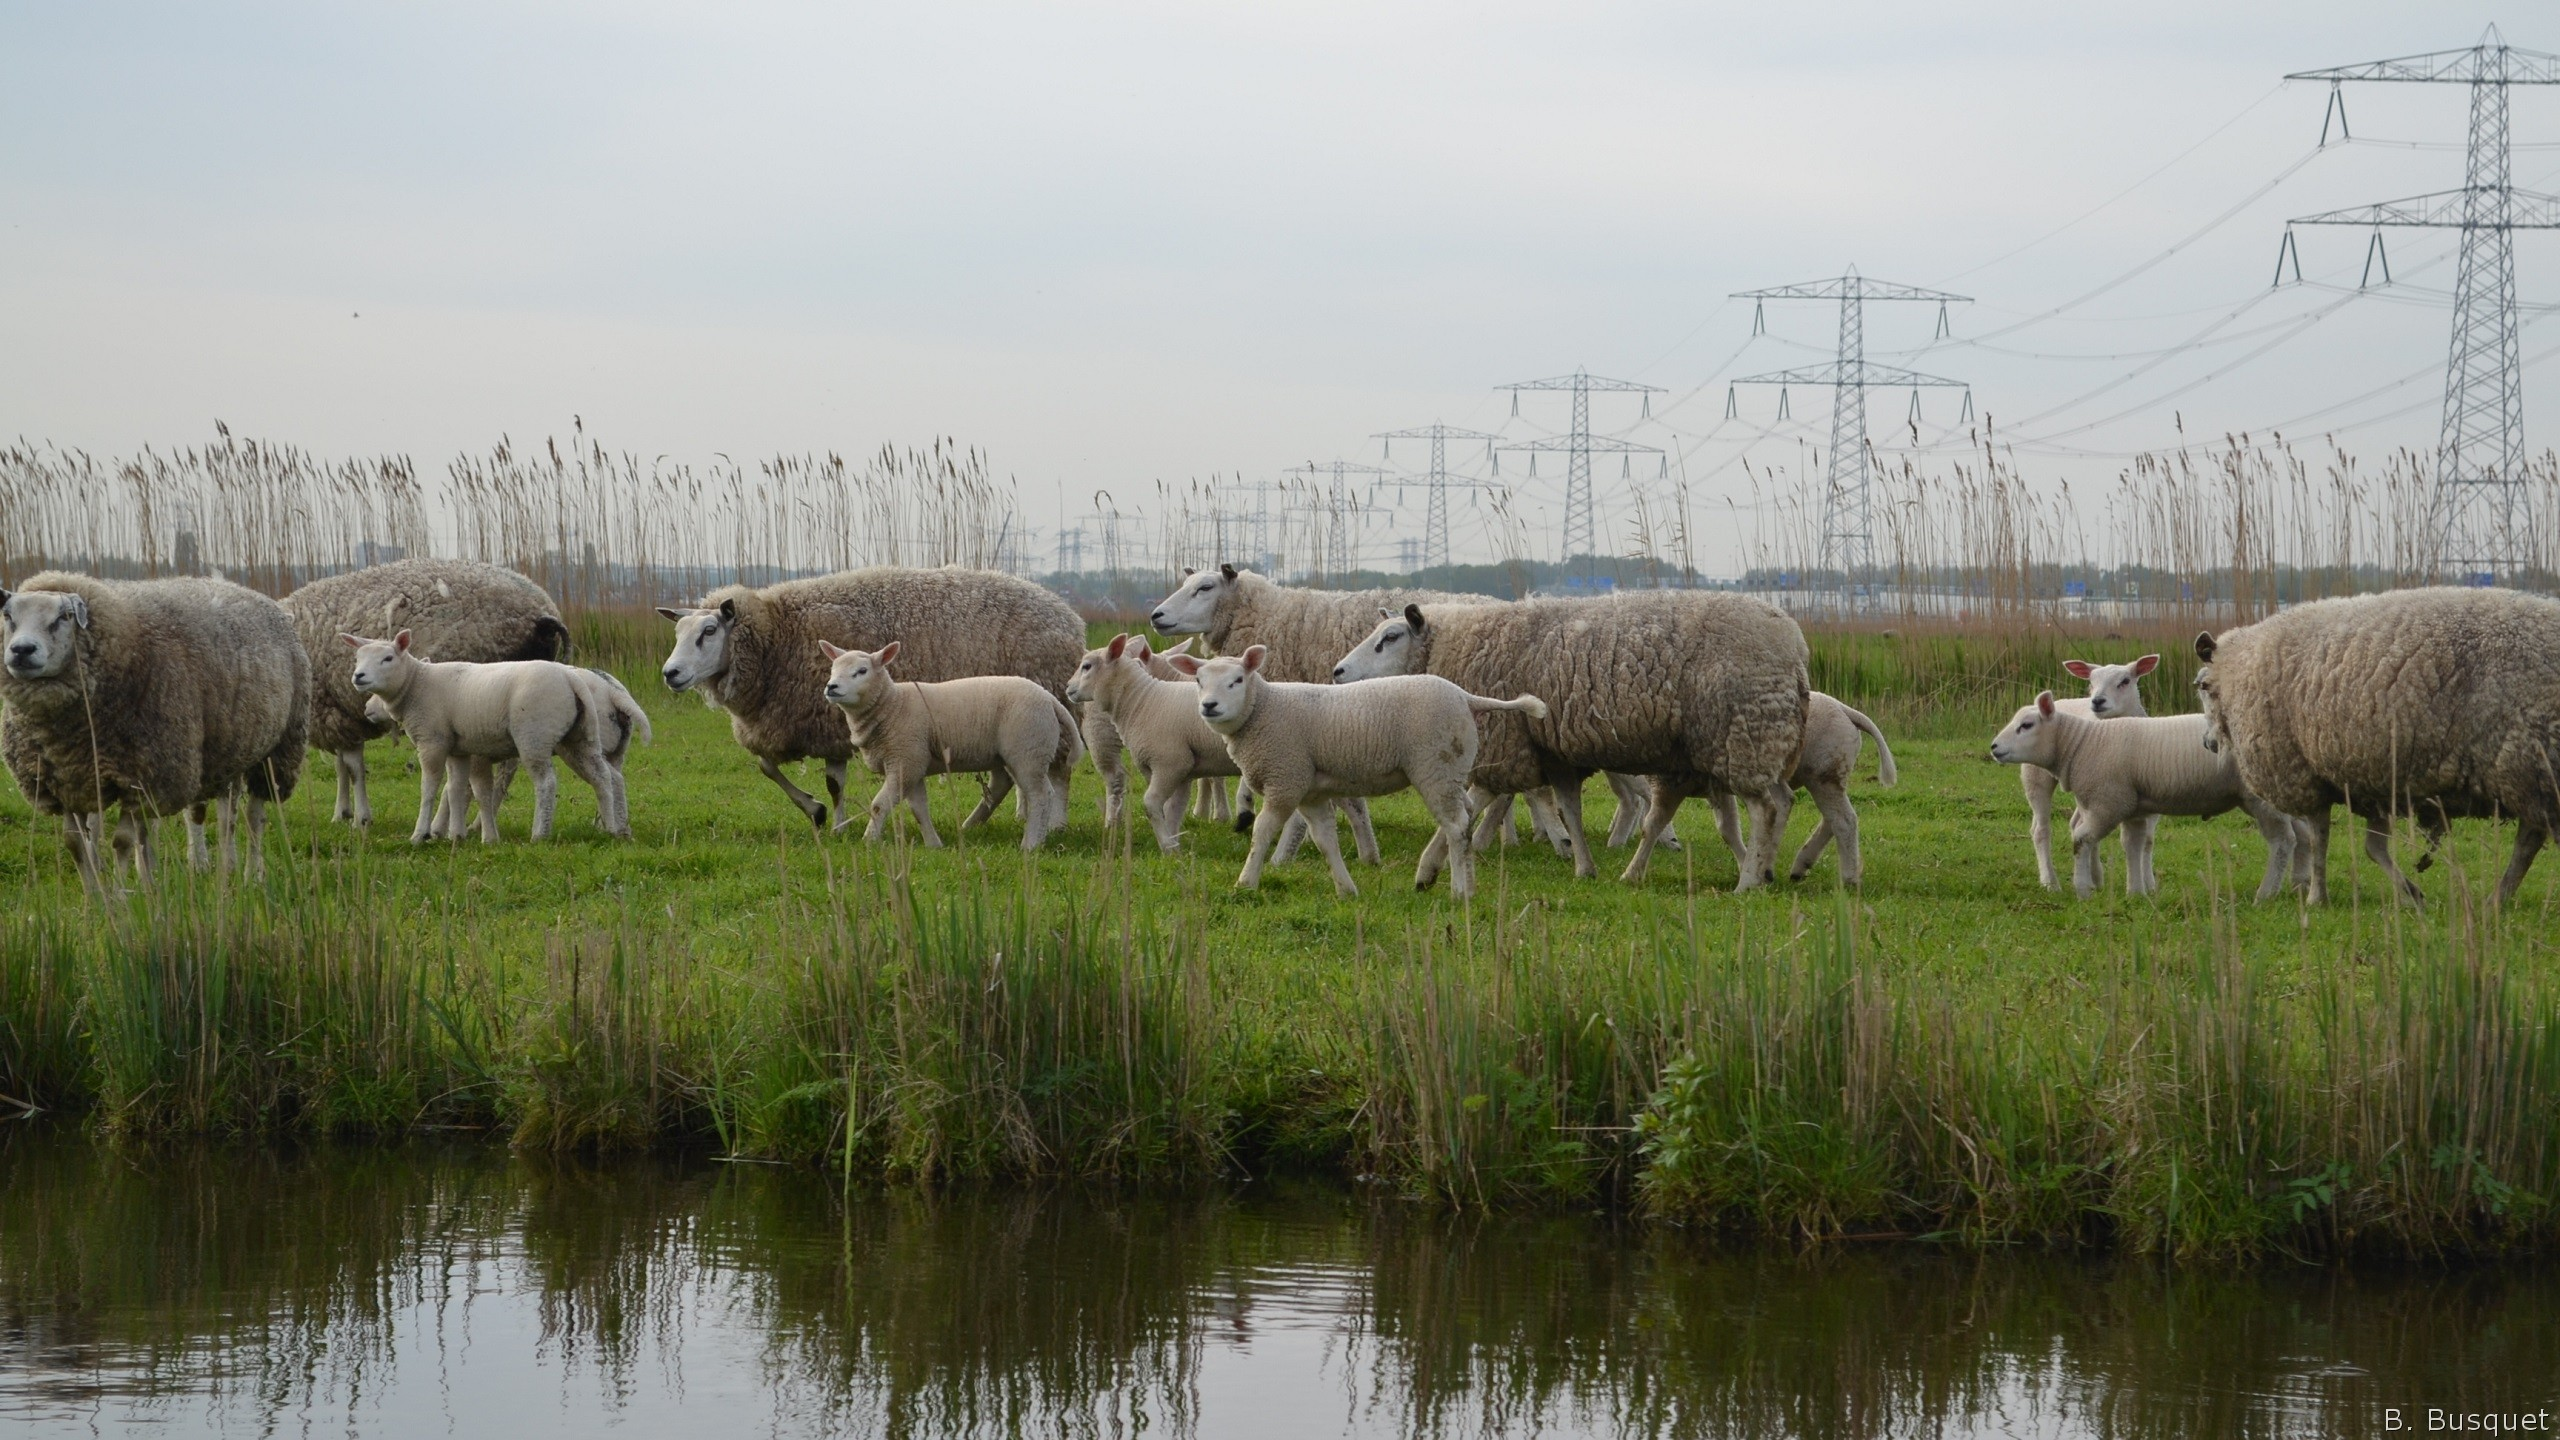 HD Sheep Wallpapers